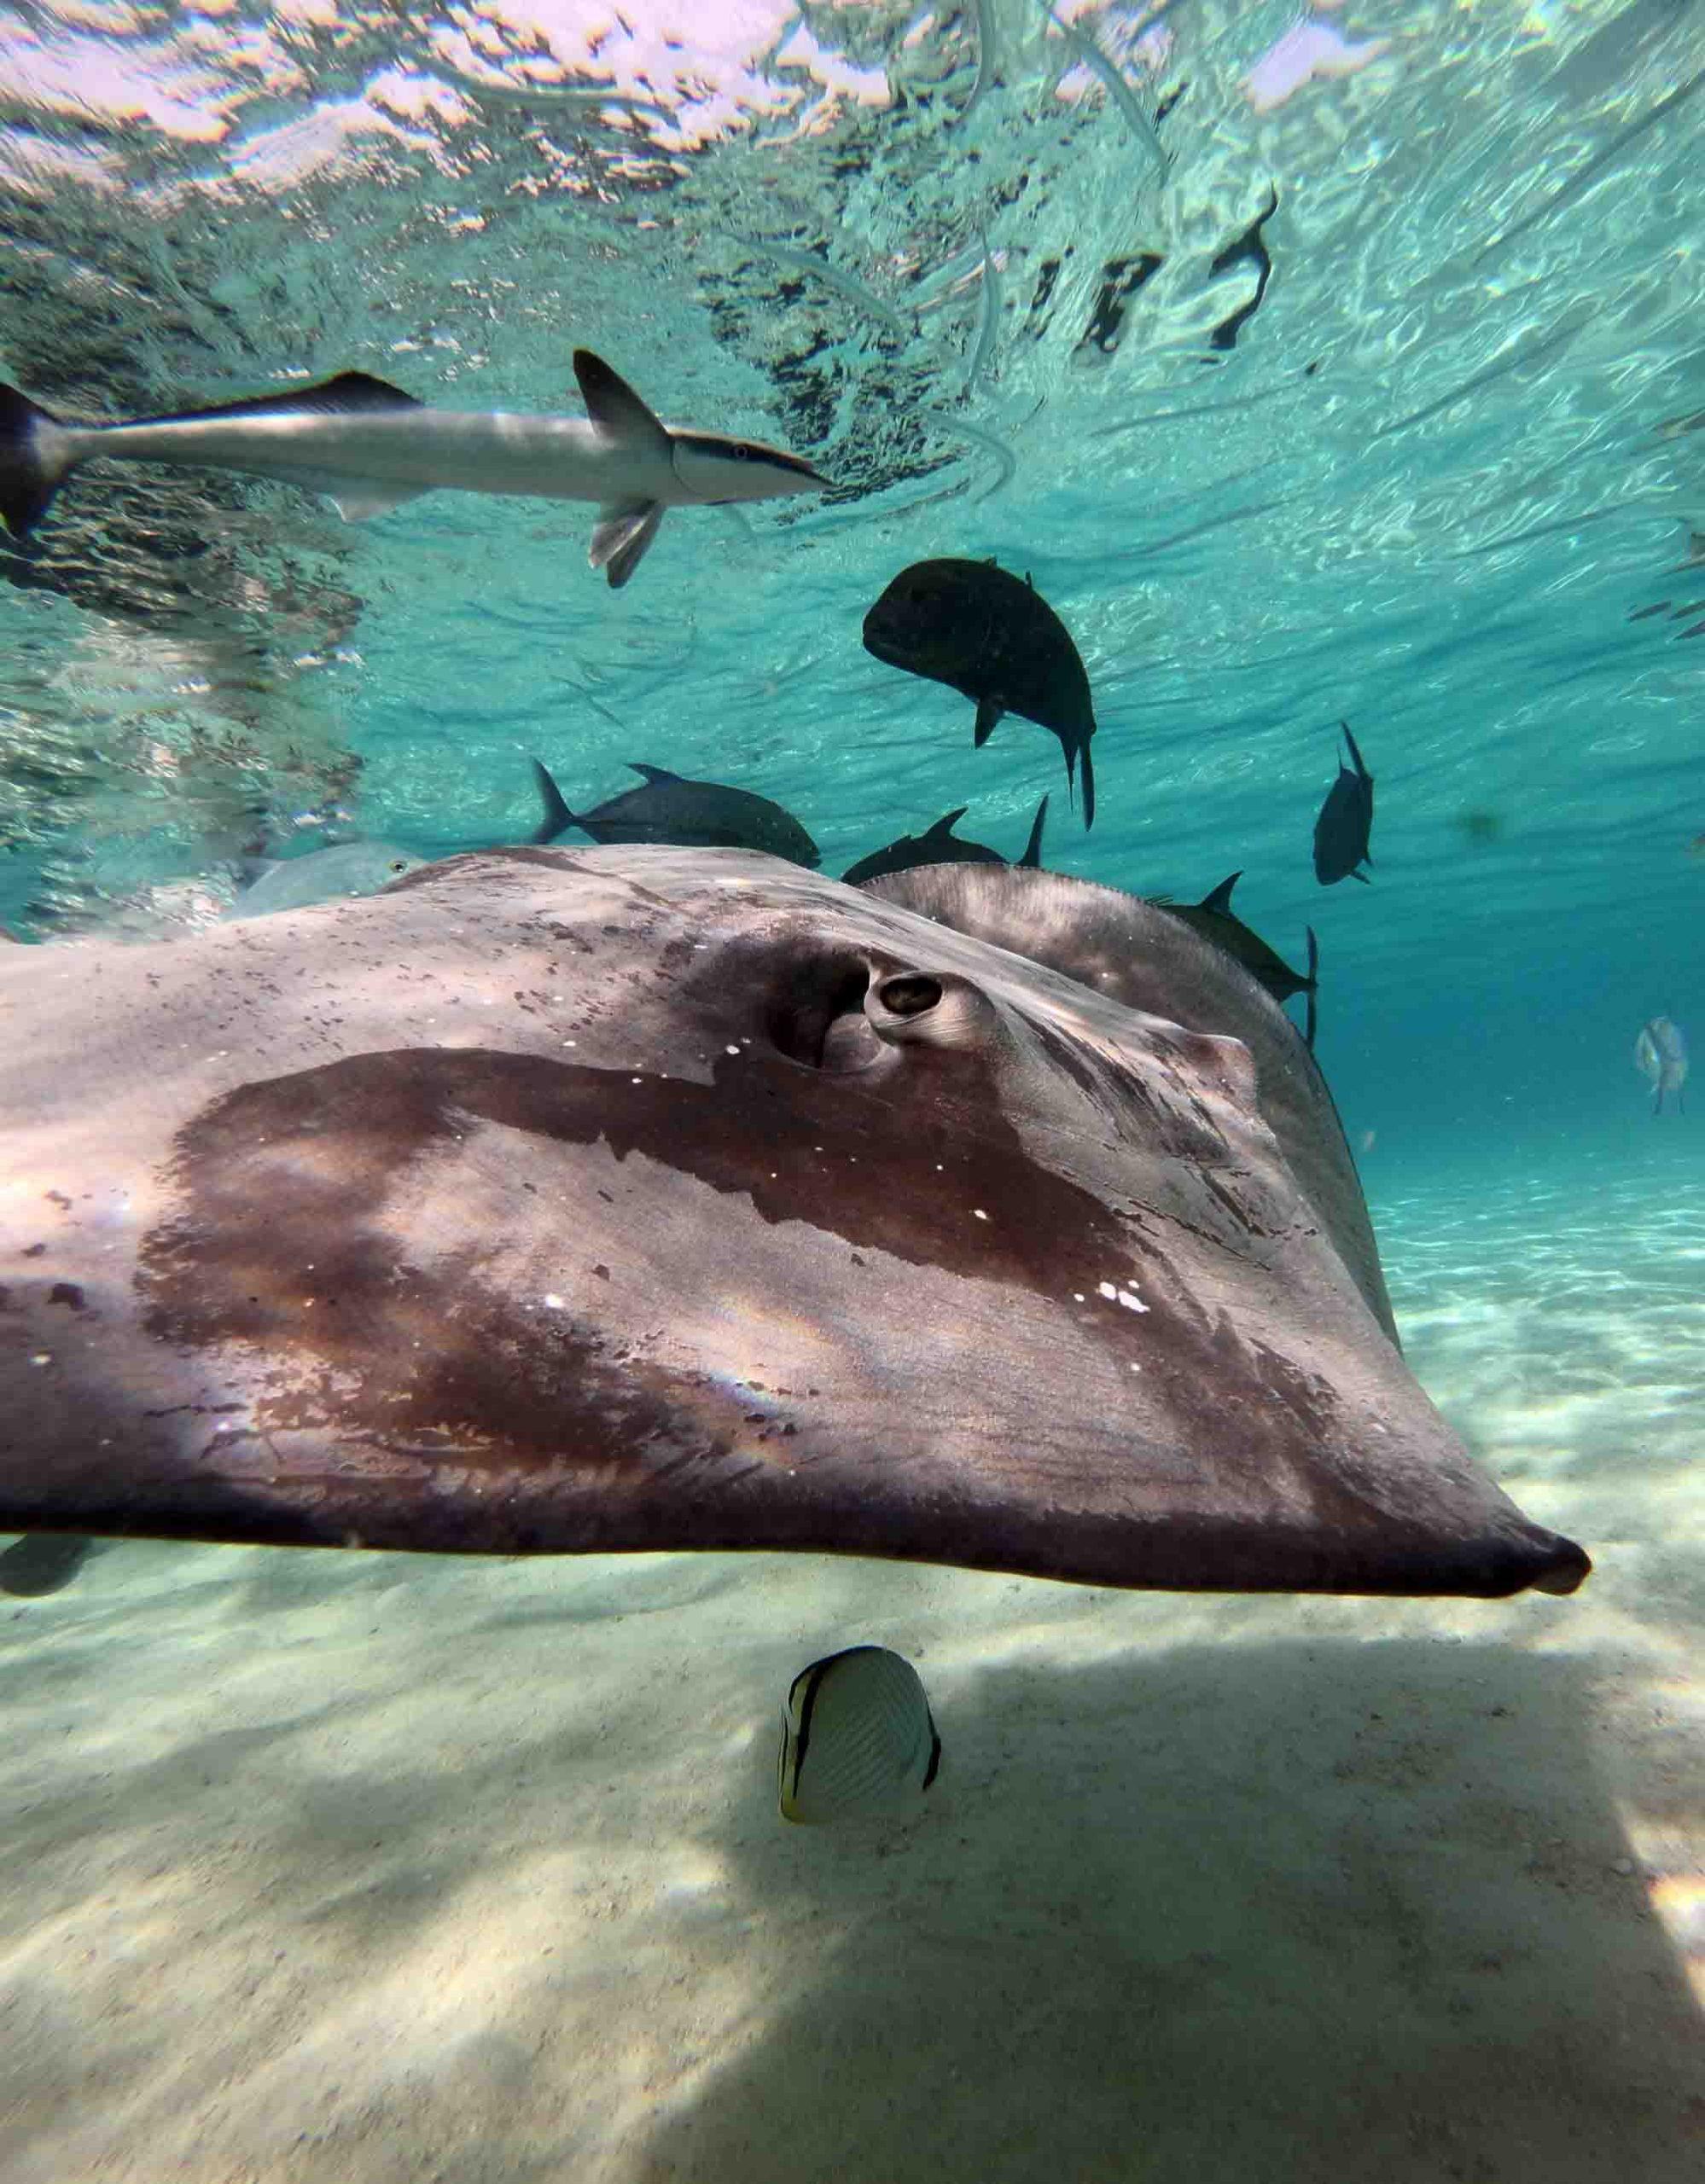 Best private Boat tours Moorea Snorkeling Marine Widlife Whales Sharks Moorea Ocean Adventures